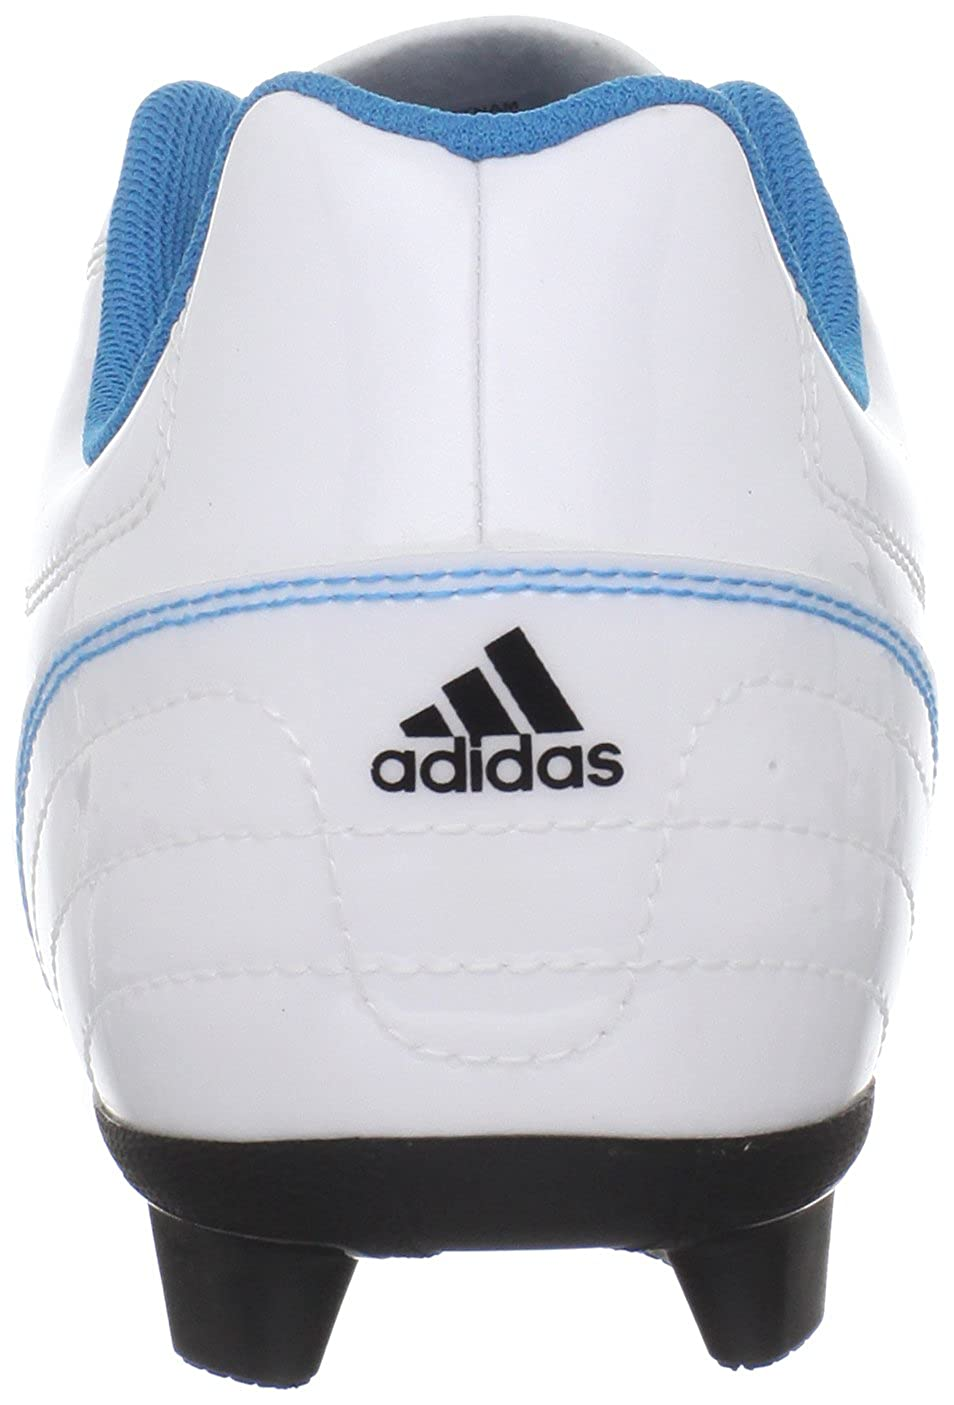 5d3f7daf139 adidas Women s Matteo Nua TRX FG Soccer Cleat